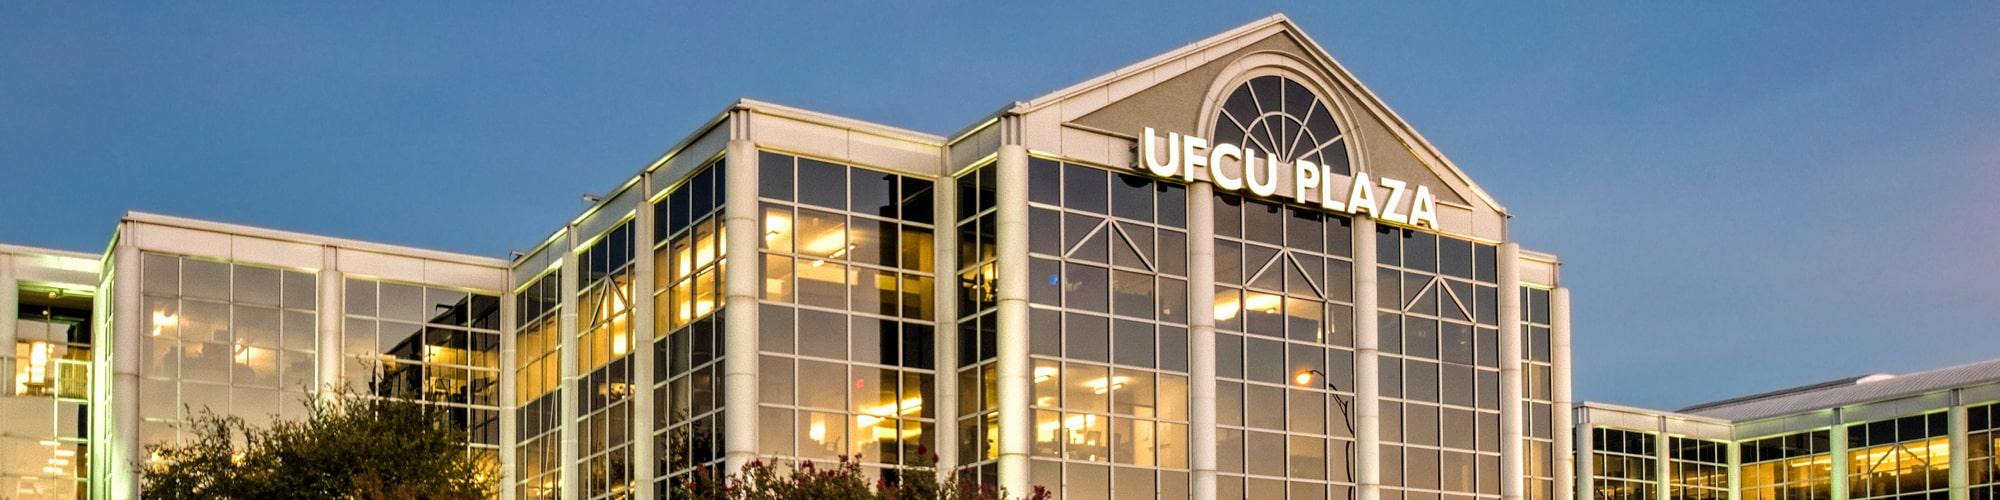 UFCU Plaza Exterior   8303 N Mopac Expressway in Austin, Texas   AQUILA Commercial